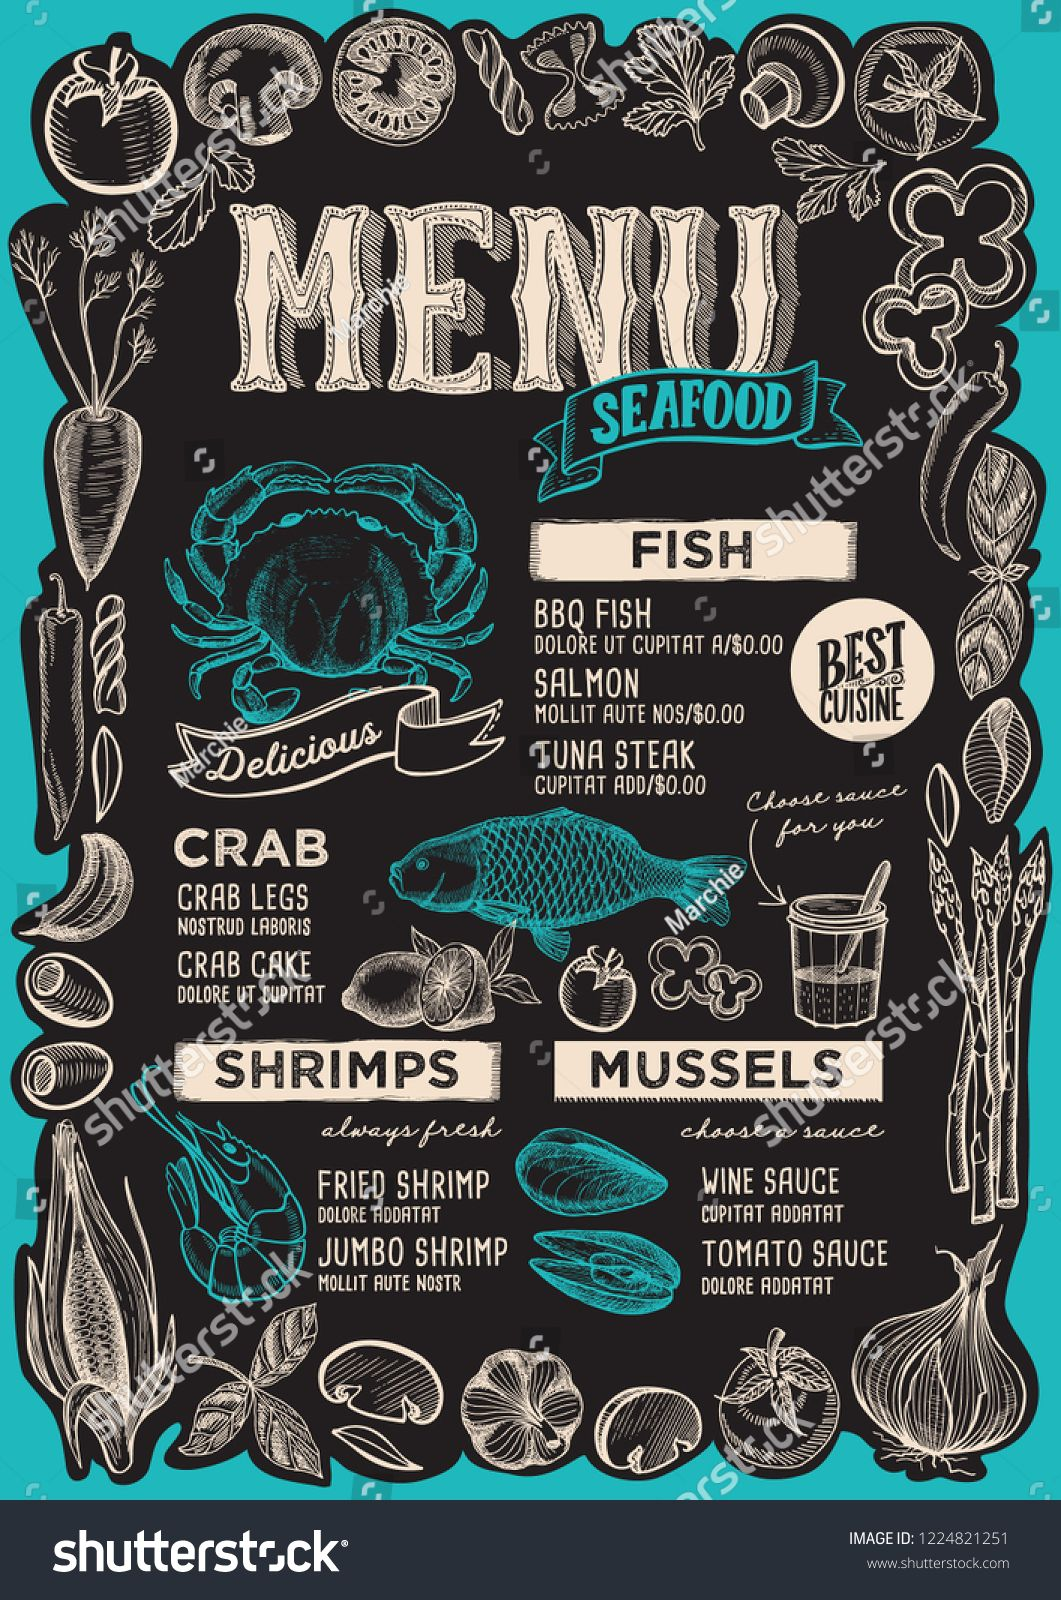 Seafood Menu Template For Restaurant On A Blackboard Background Vector Illustration Brochure For Food And Drink Cafe Design Seafood Menu Seafood Menu Template